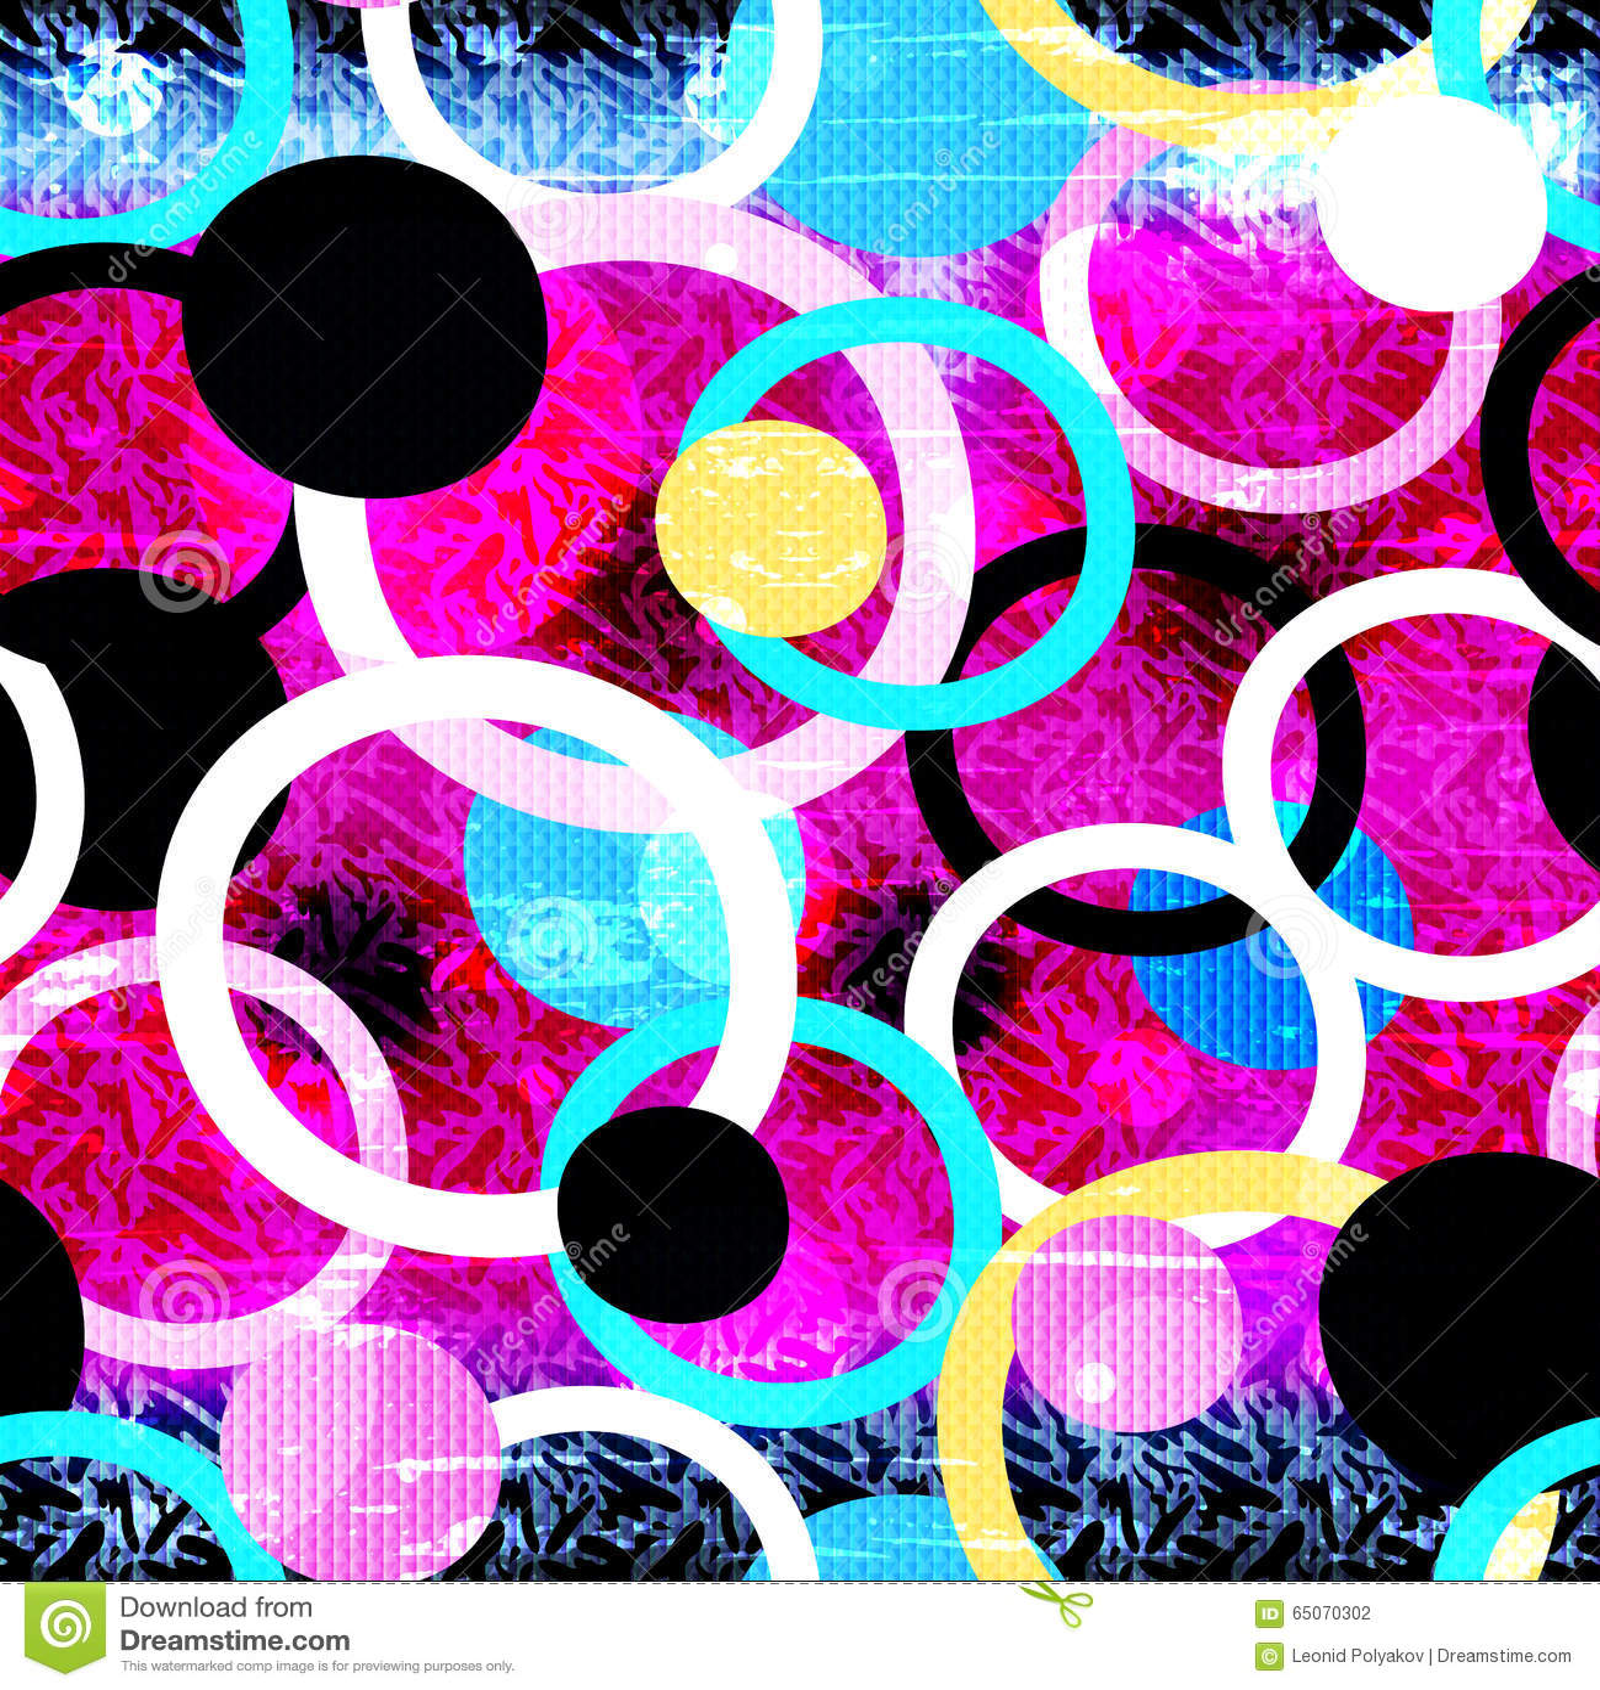 Colored Graffiti Seamless Texture Stock Illustration - Illustration ...